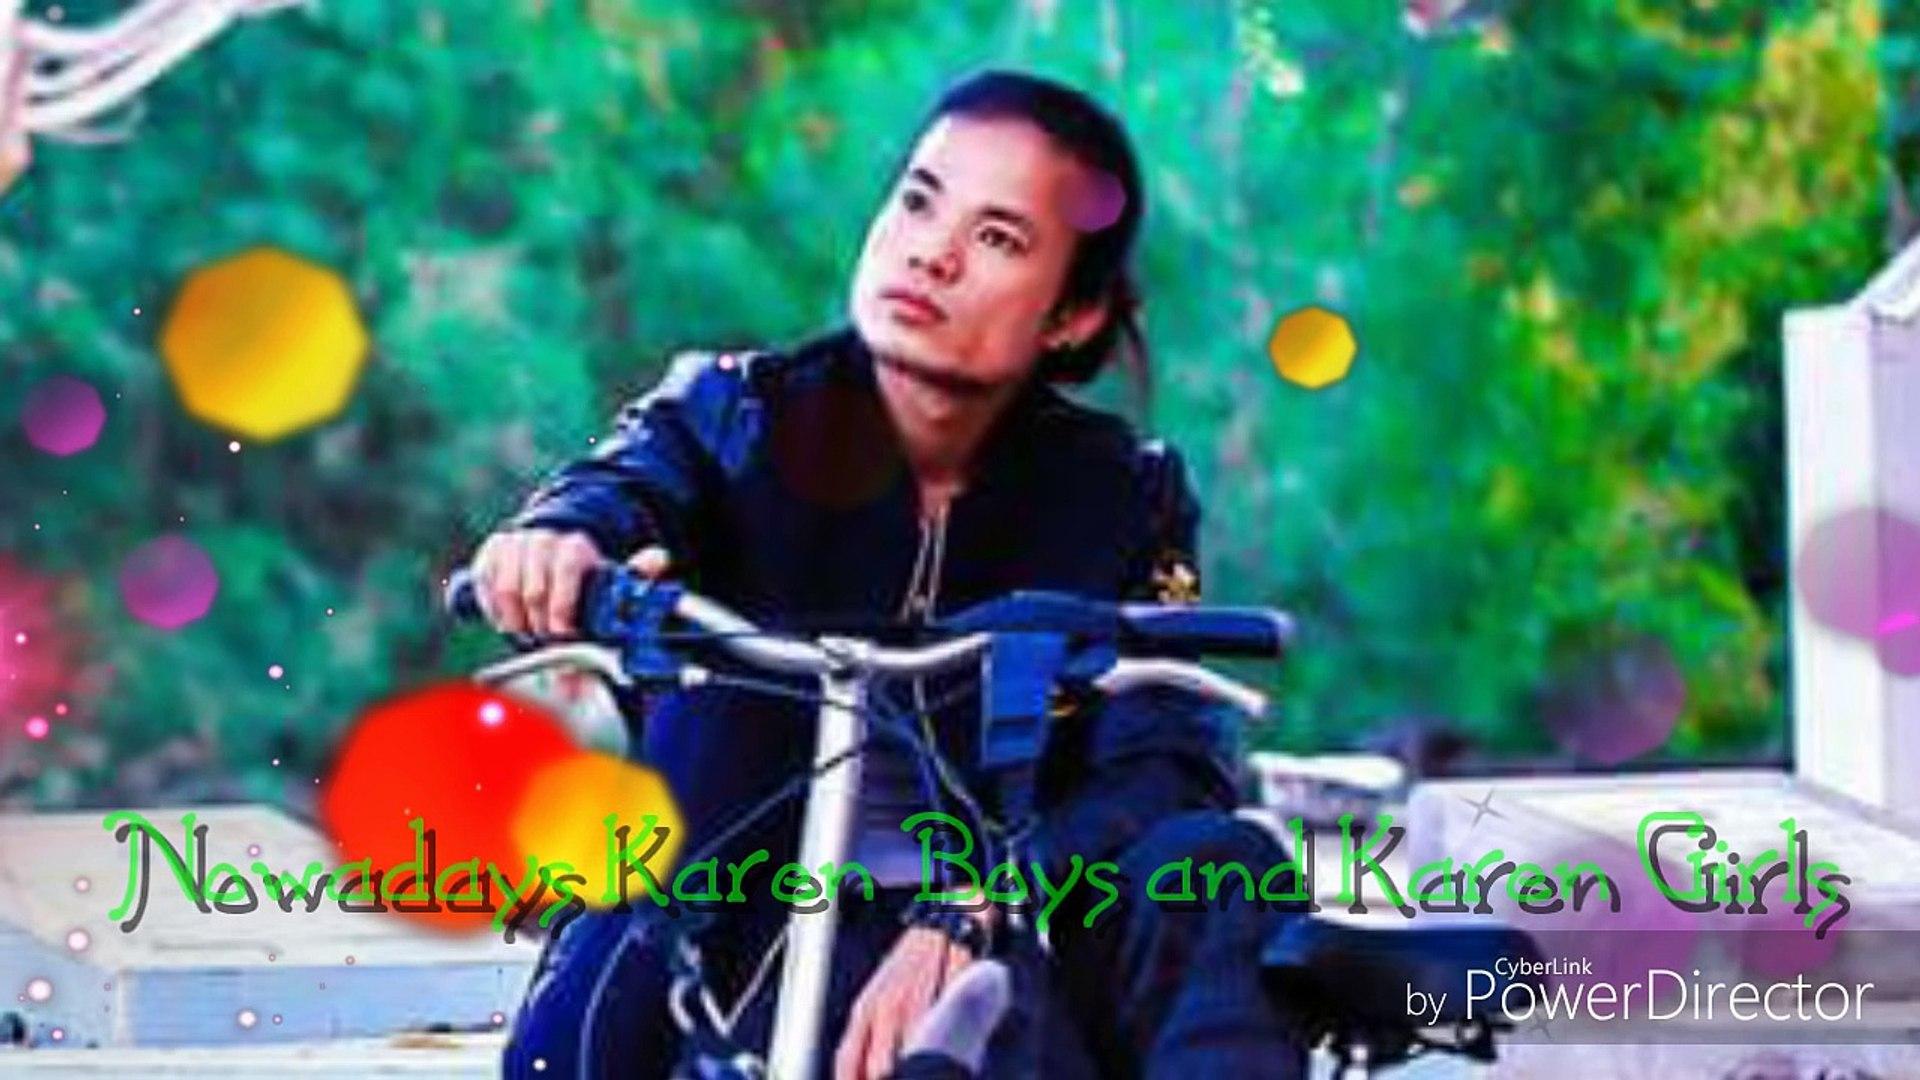 Karen New Song 2017 Nowadays Karen Boys and Karen Girls by Saw Black and Talweh